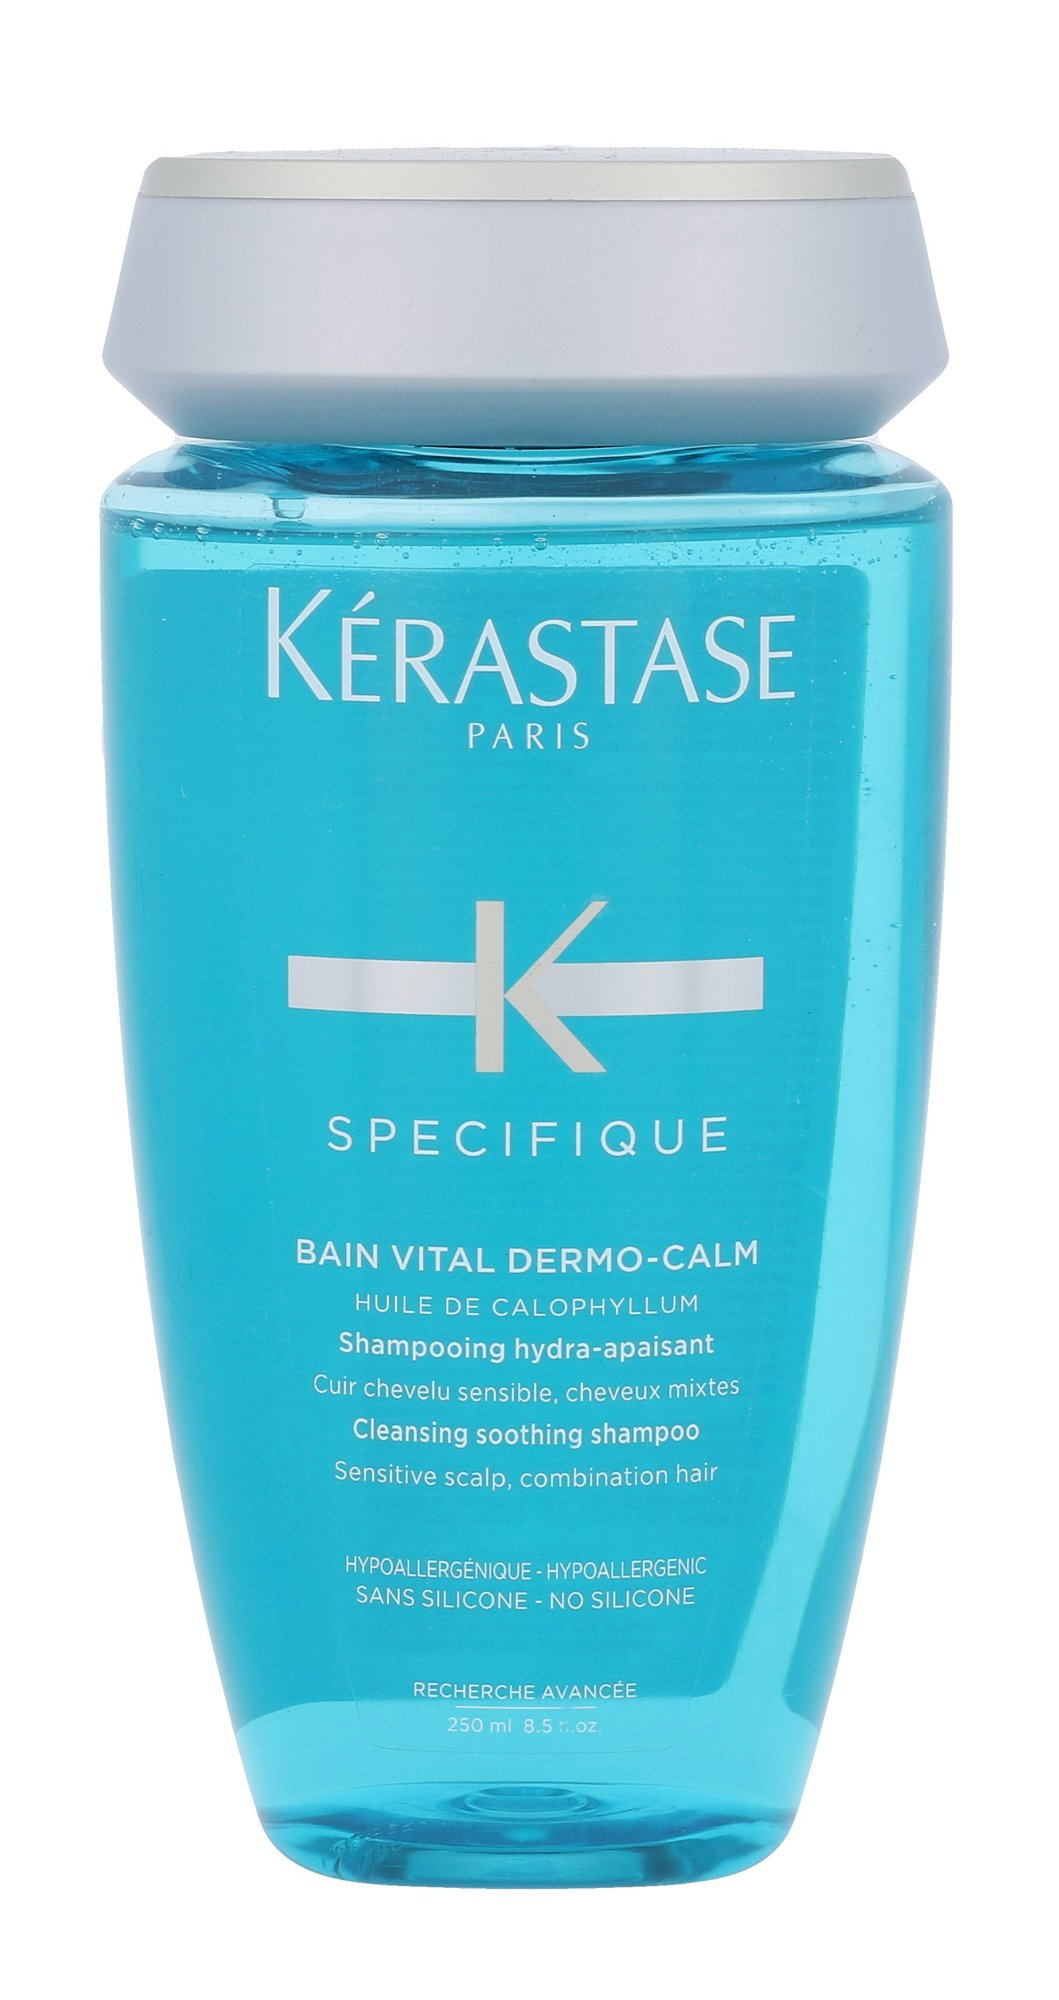 Kérastase Spécifique Cosmetic 250ml